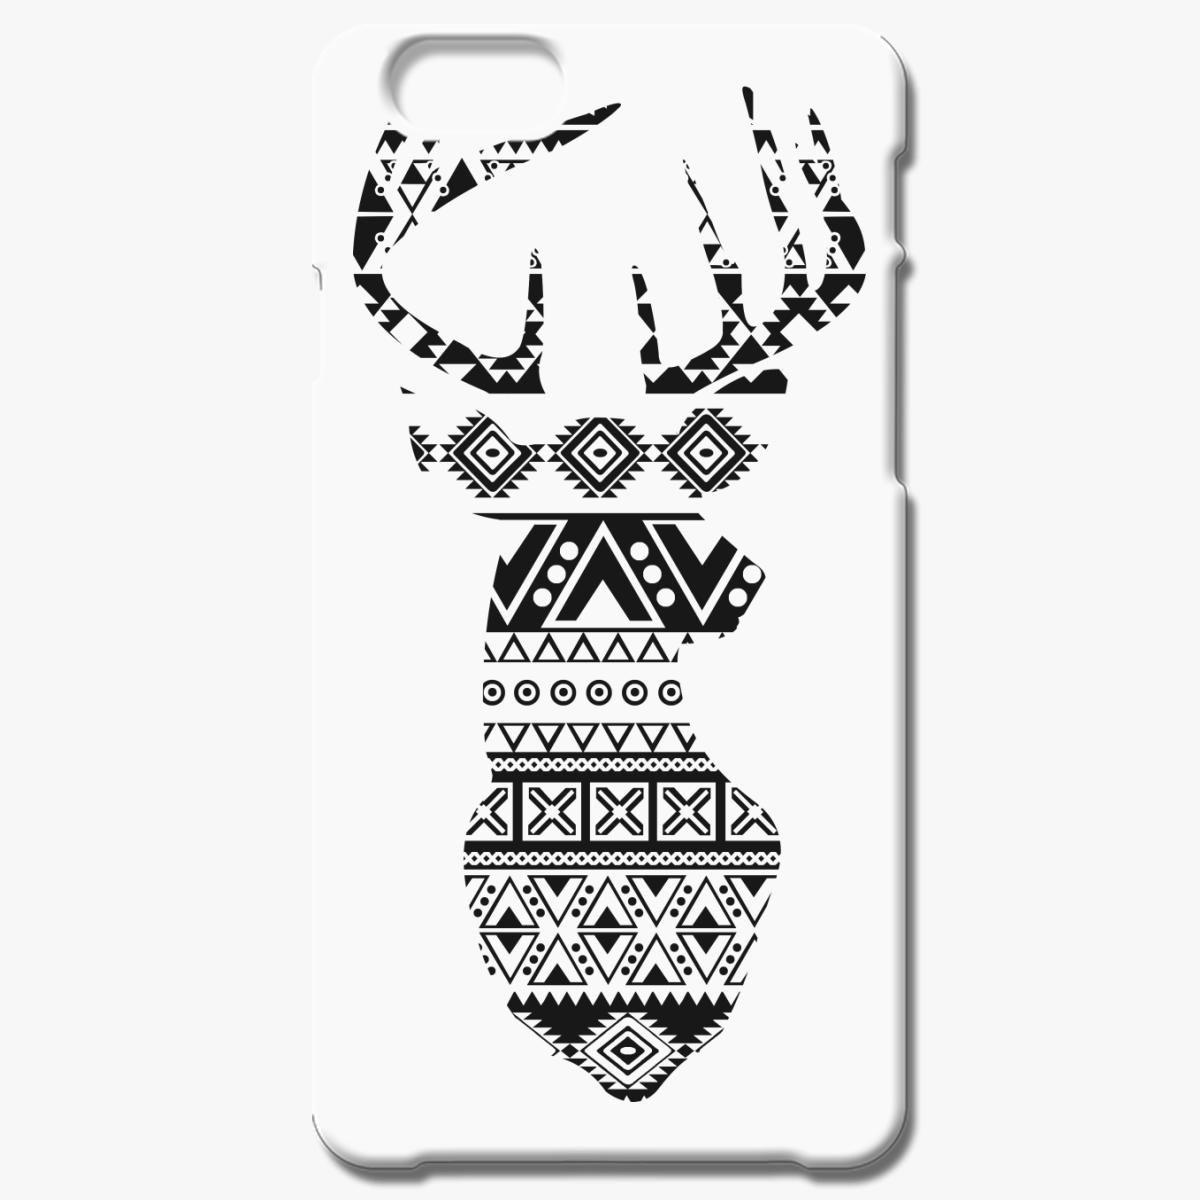 Deer Aztec Pattern Iphone 6 6s Plus Case